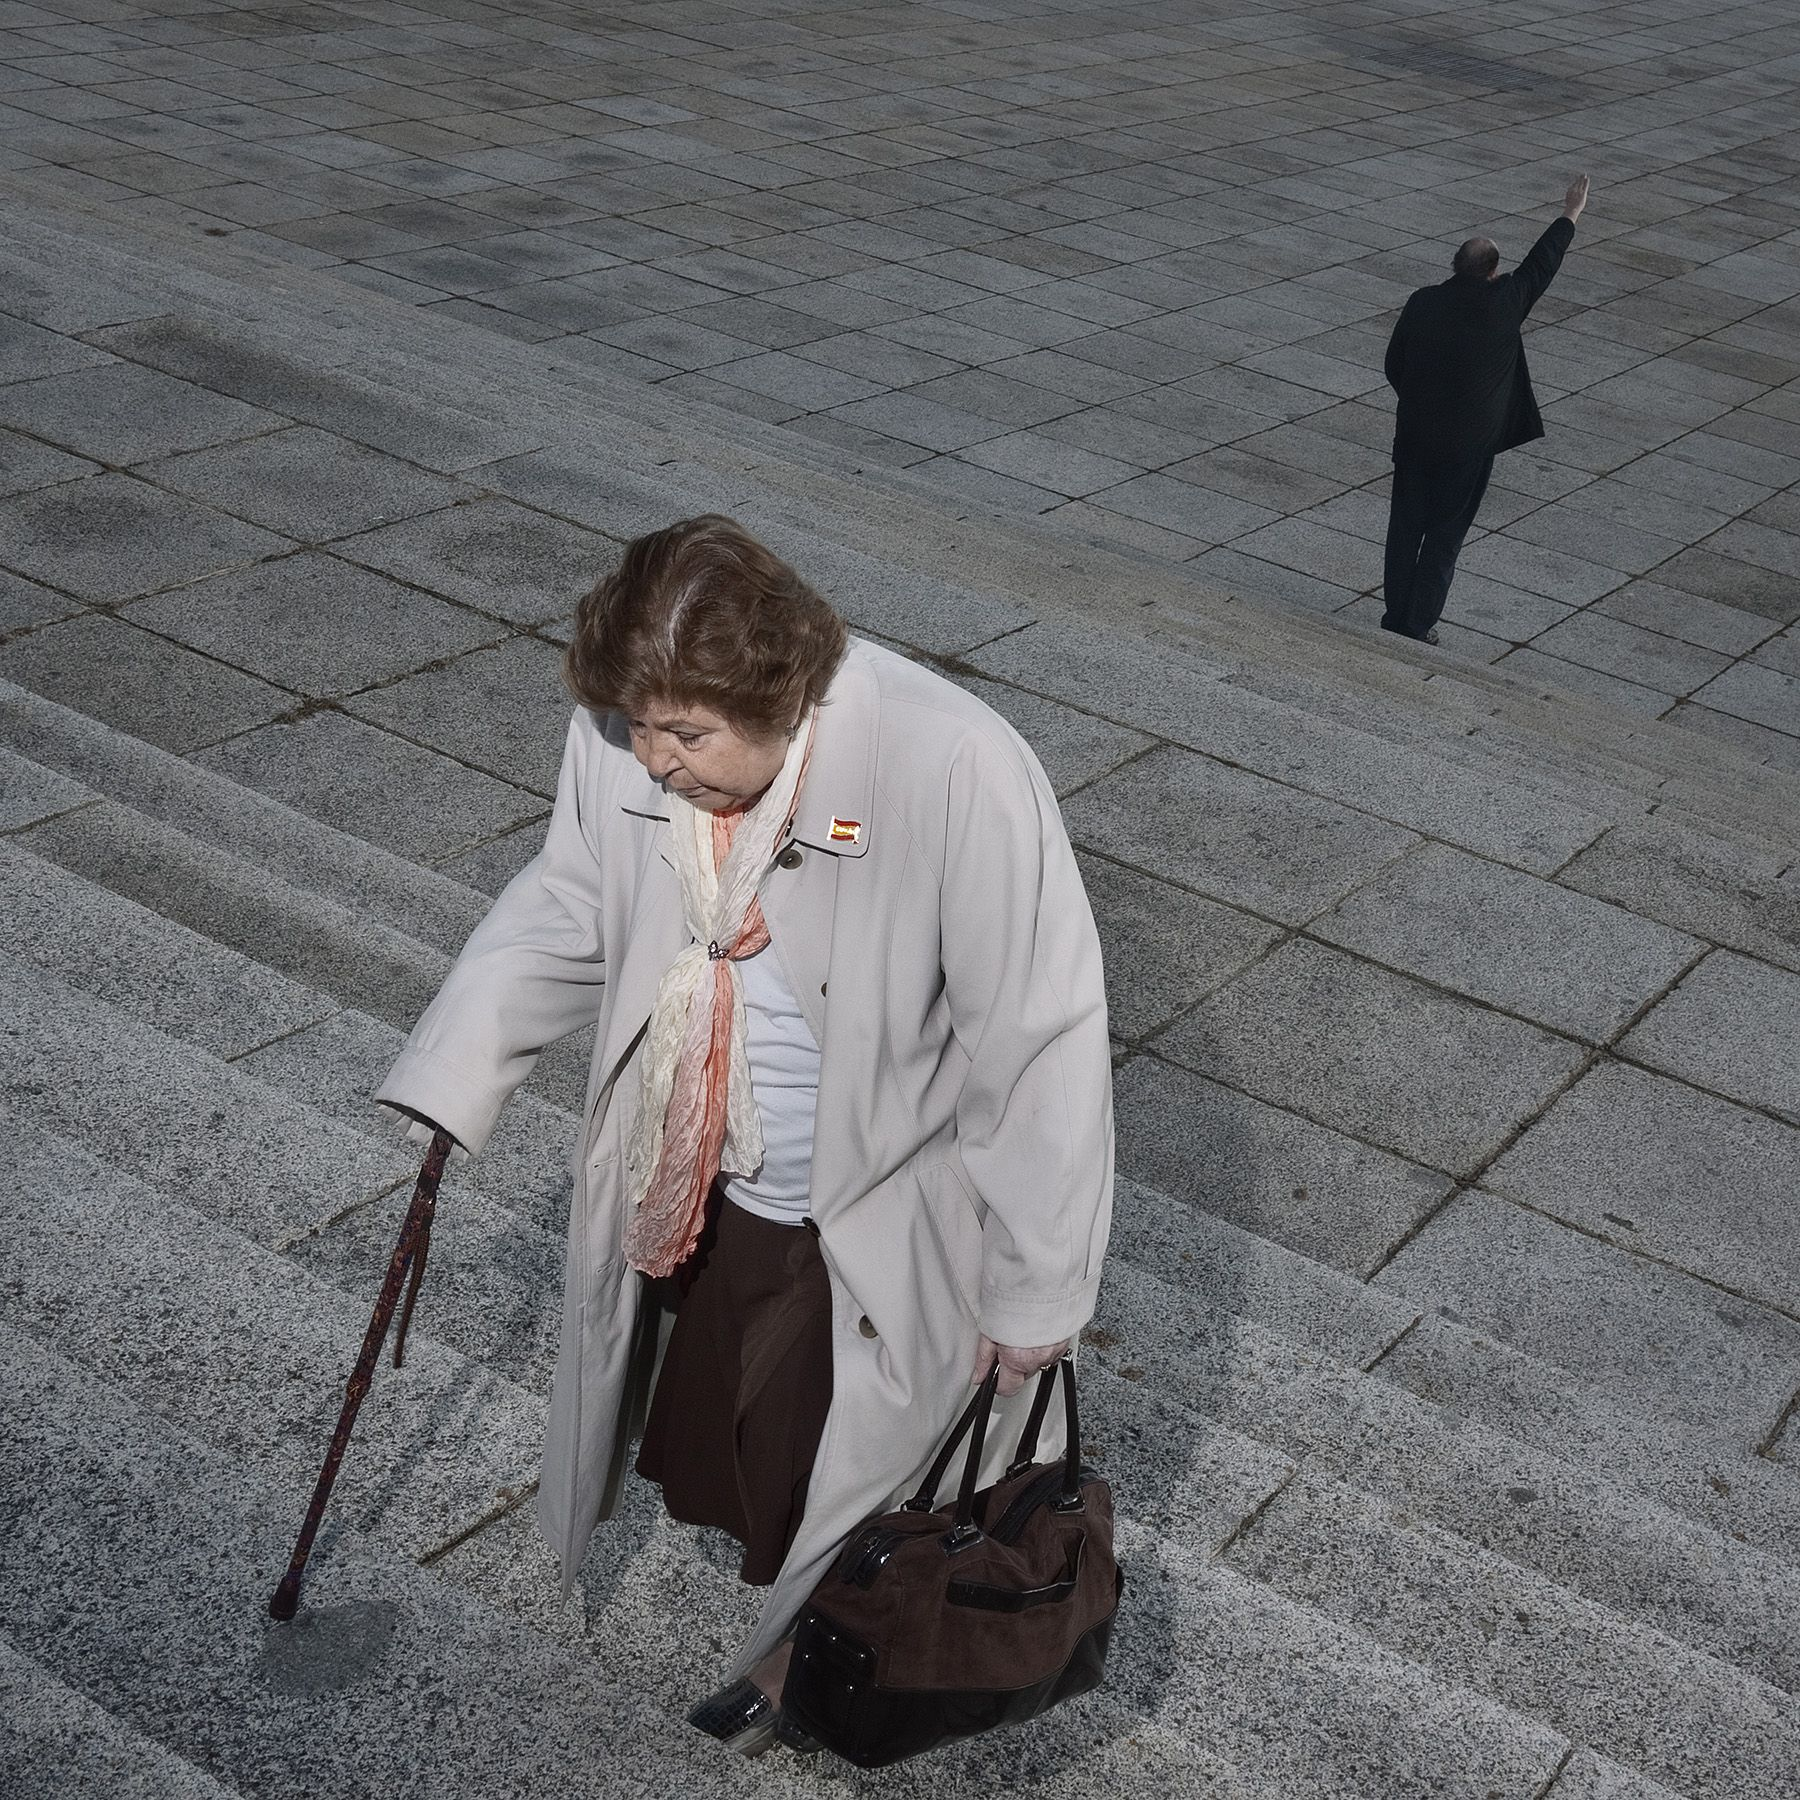 La mirada de Toni Amengual sobre el Valle de los CaÍdos llega a Es Baluard de Palma